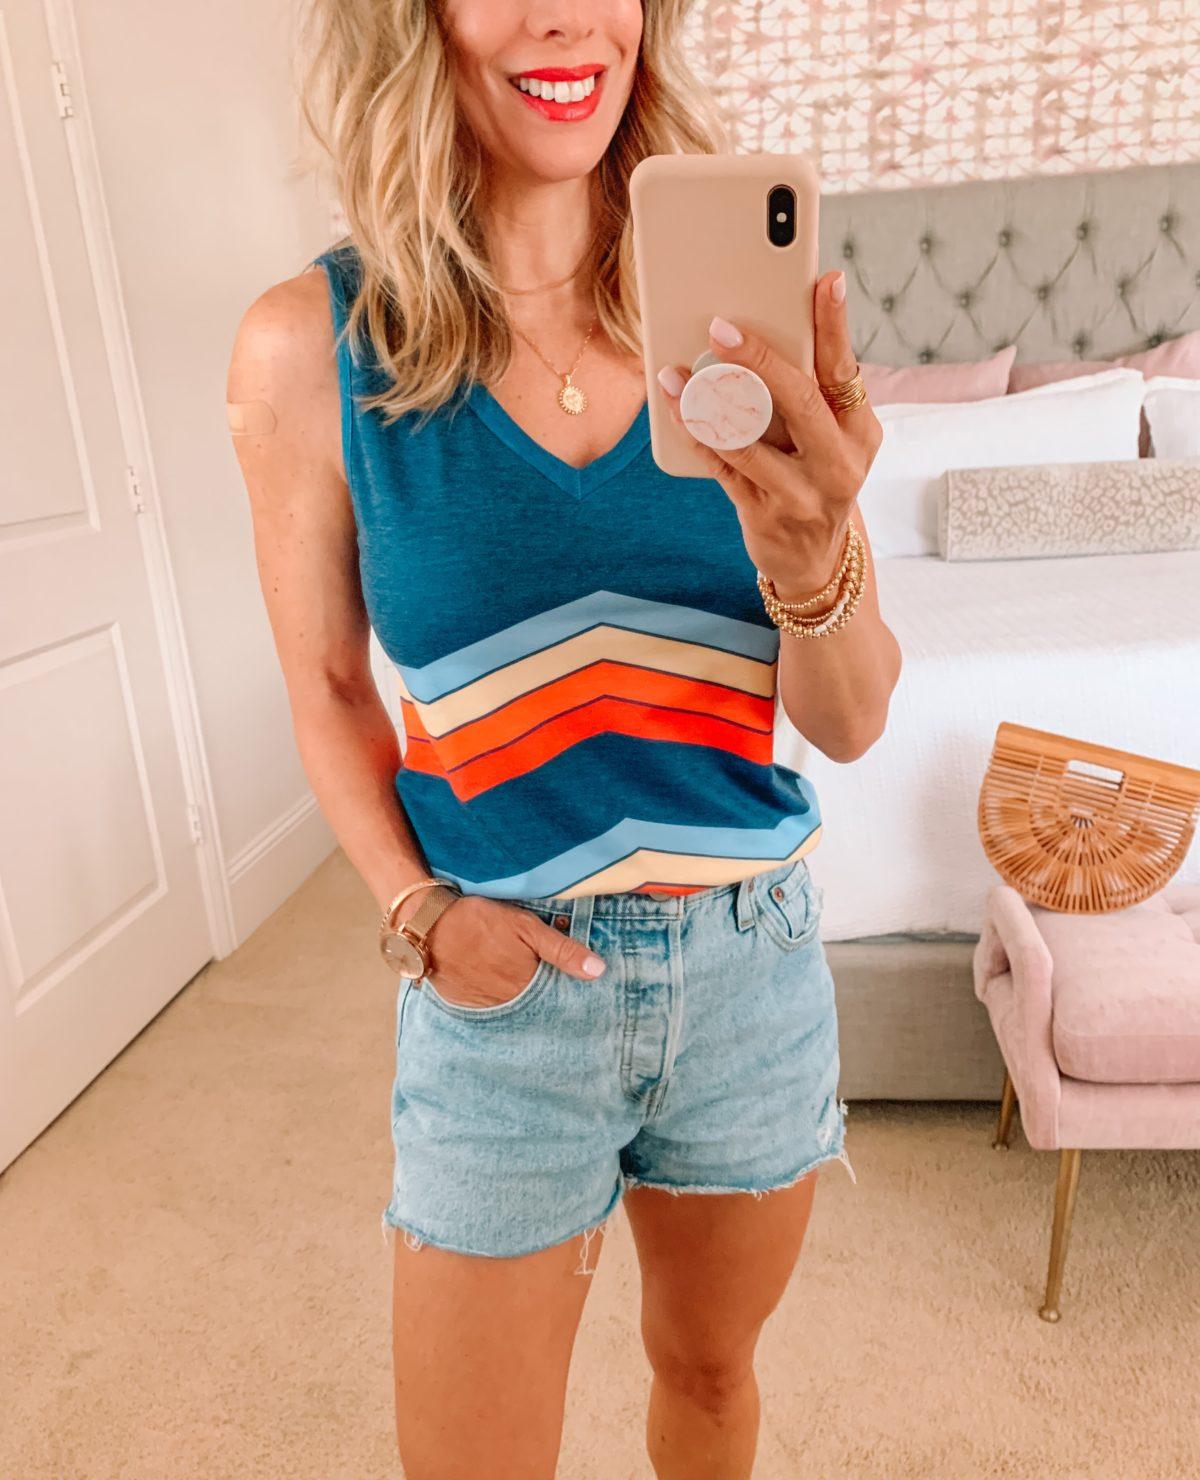 Amazon Fashion Finds, Rainbow Stripe Tank, Jean Shorts, Sneakers, Bamboo Clutch